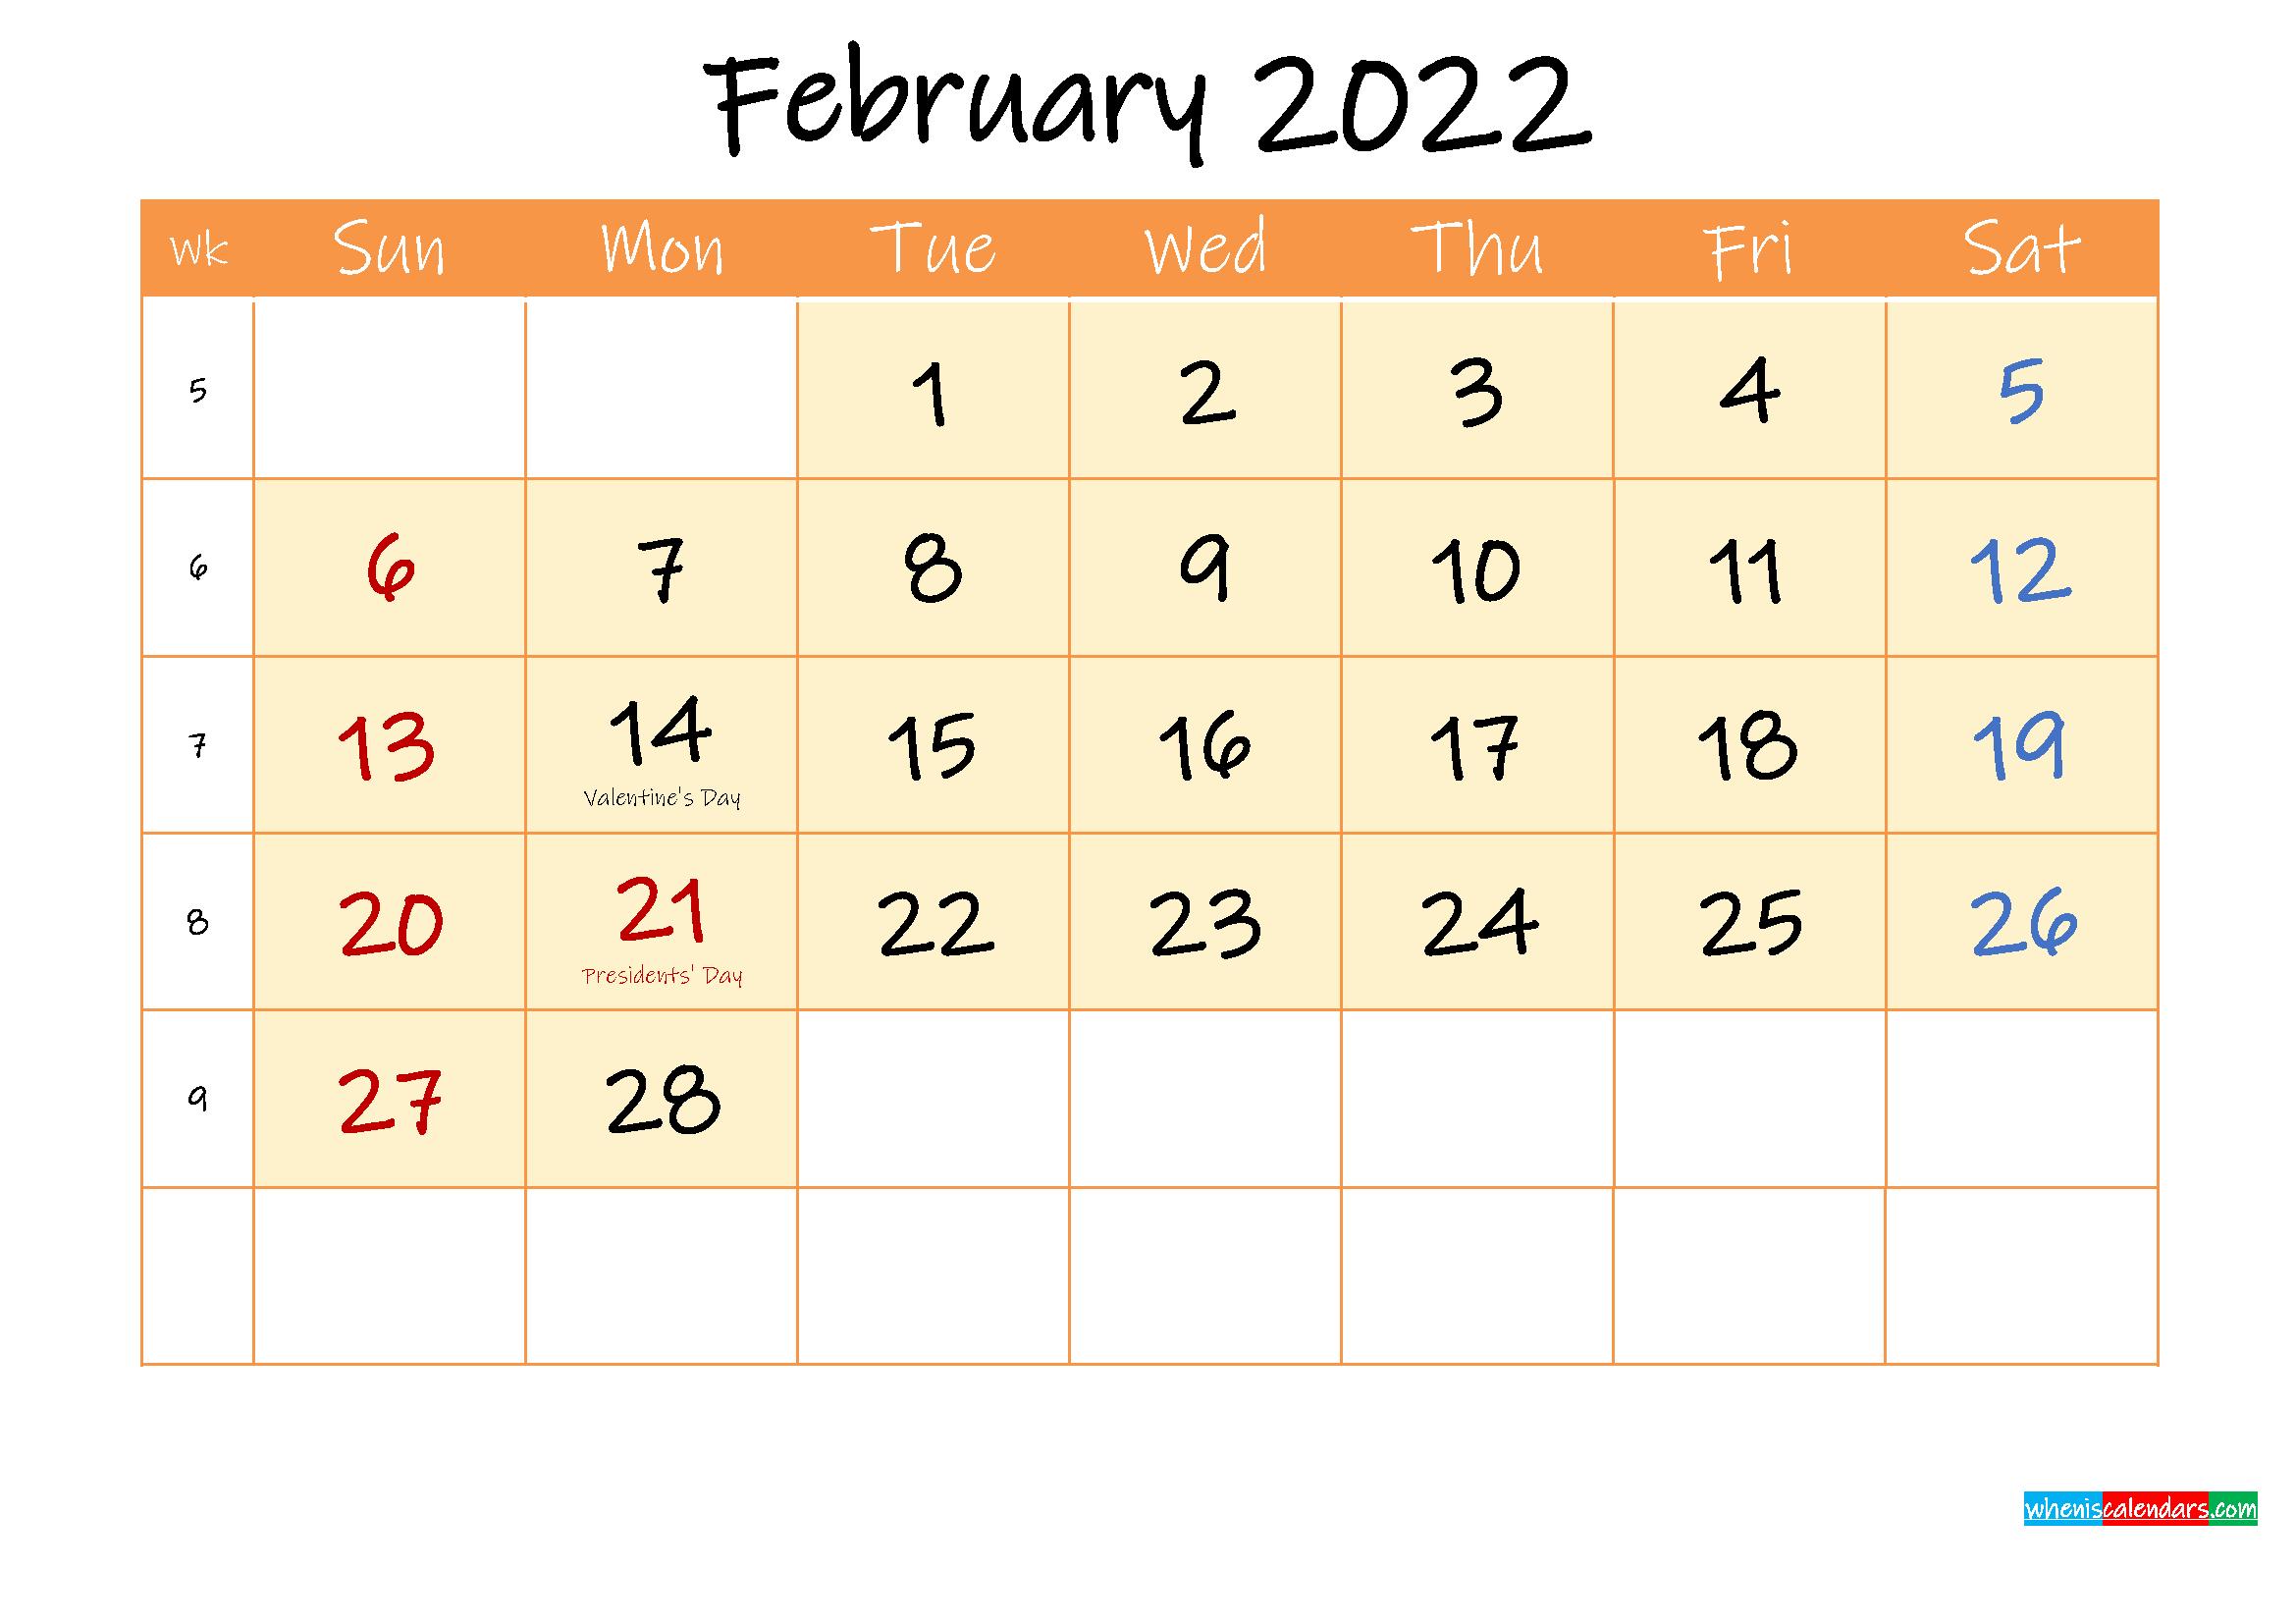 February 2022 Free Printable Calendar – Template Ink22M158 Pertaining To Printable February 2022 Calendar